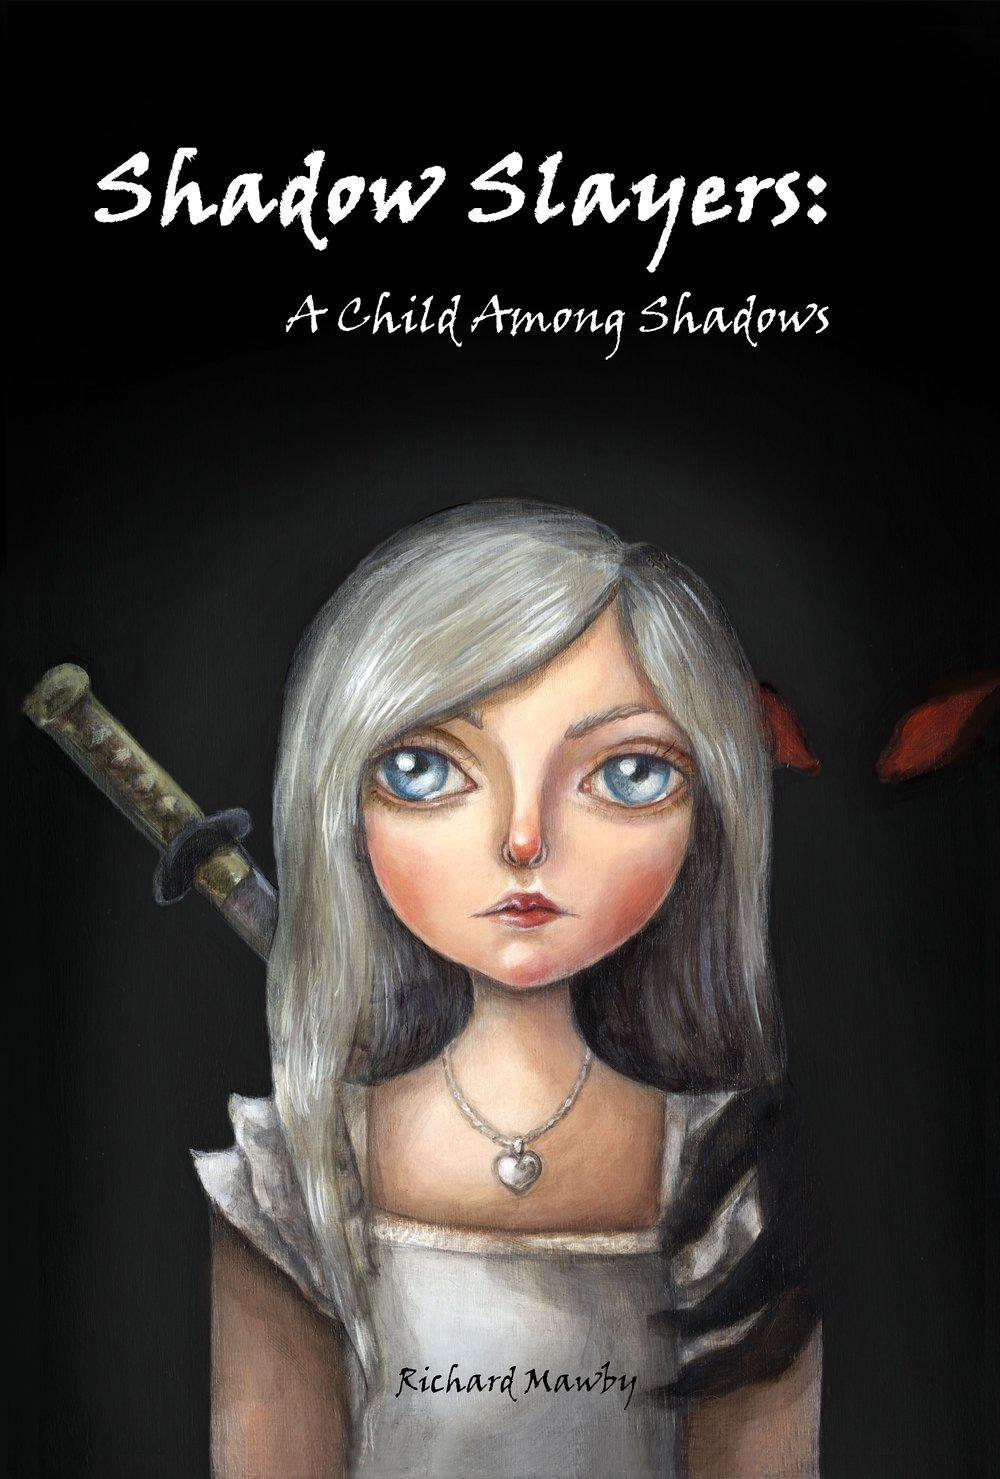 ShadowSlayersFRONT.jpg